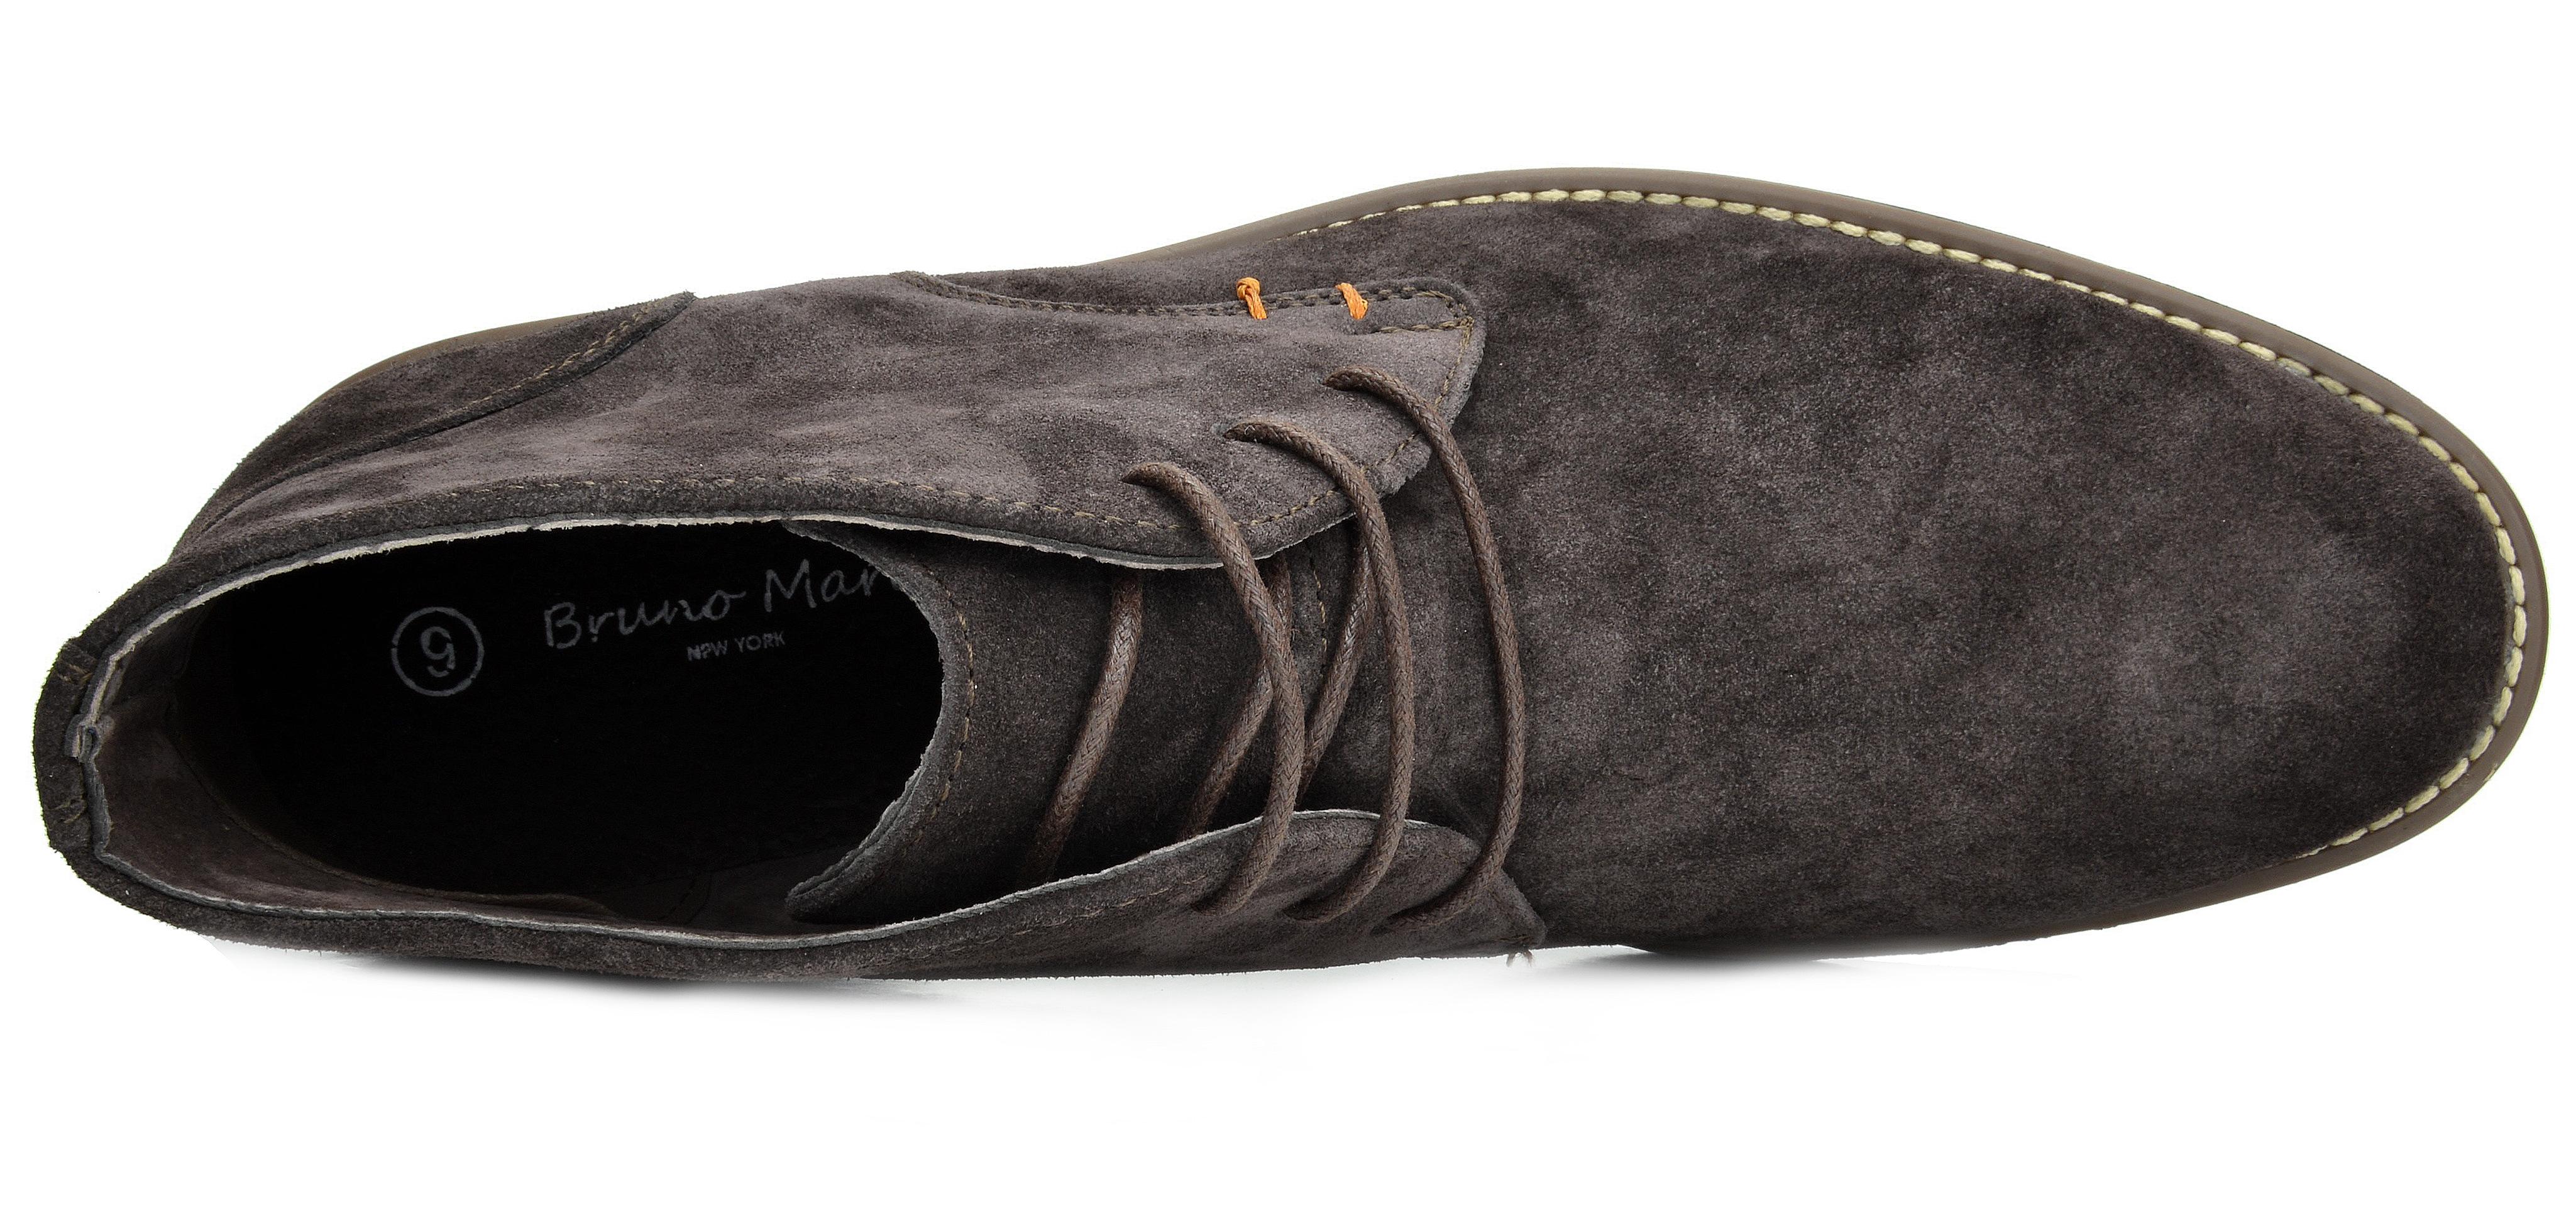 7c05e9f30eb4c Bruno Marc Men Urban Suede Leather Lace up Oxfords Desert Short ...